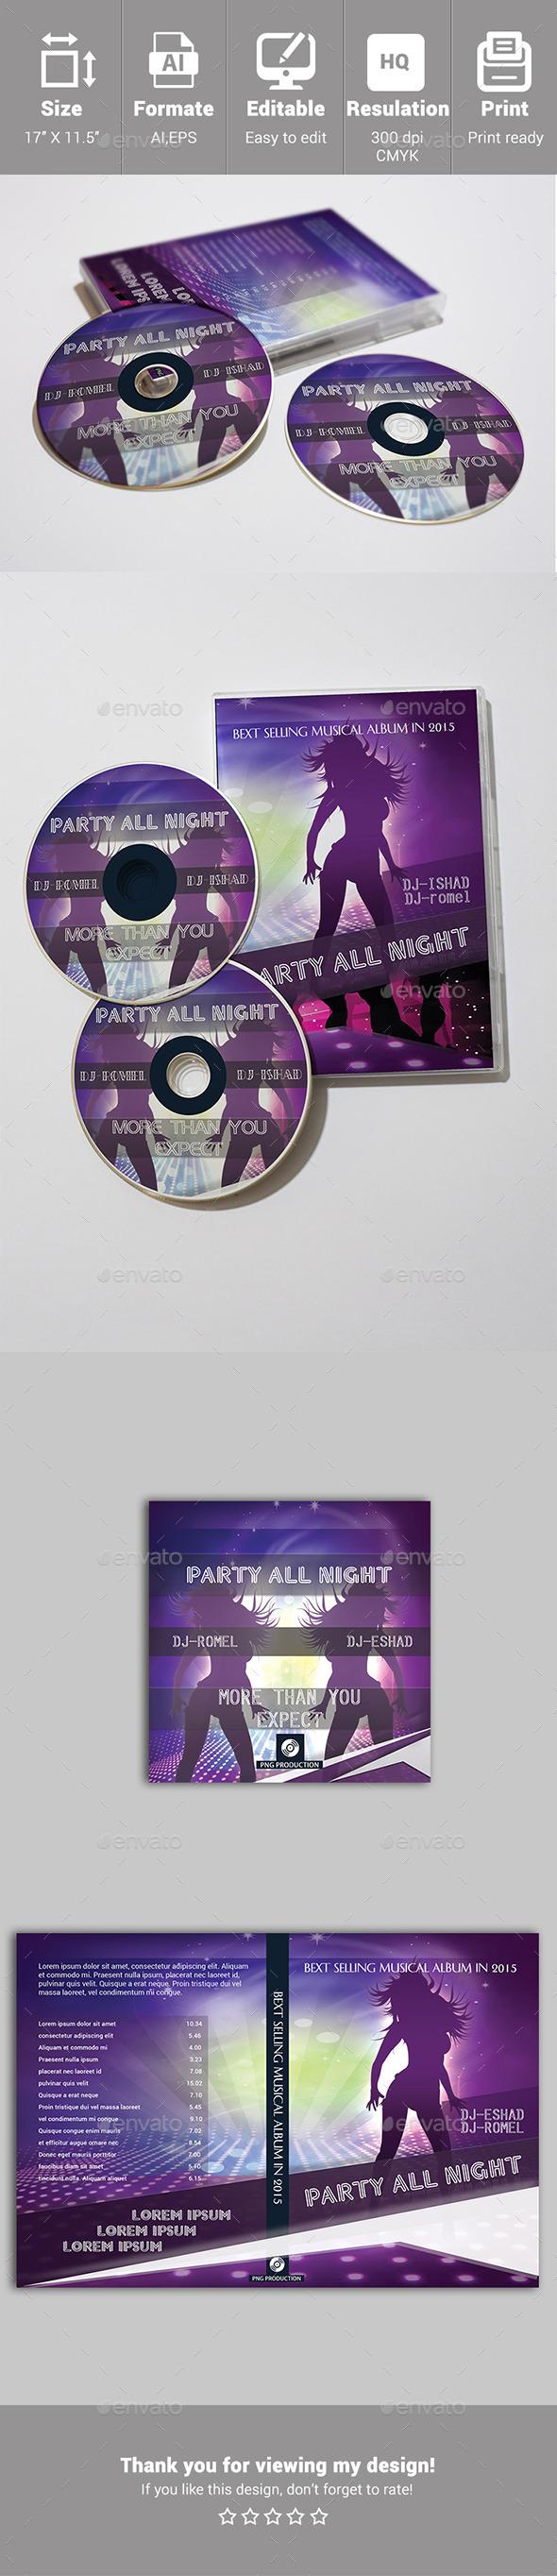 GraphicRiver DVD Cover Template 10690240